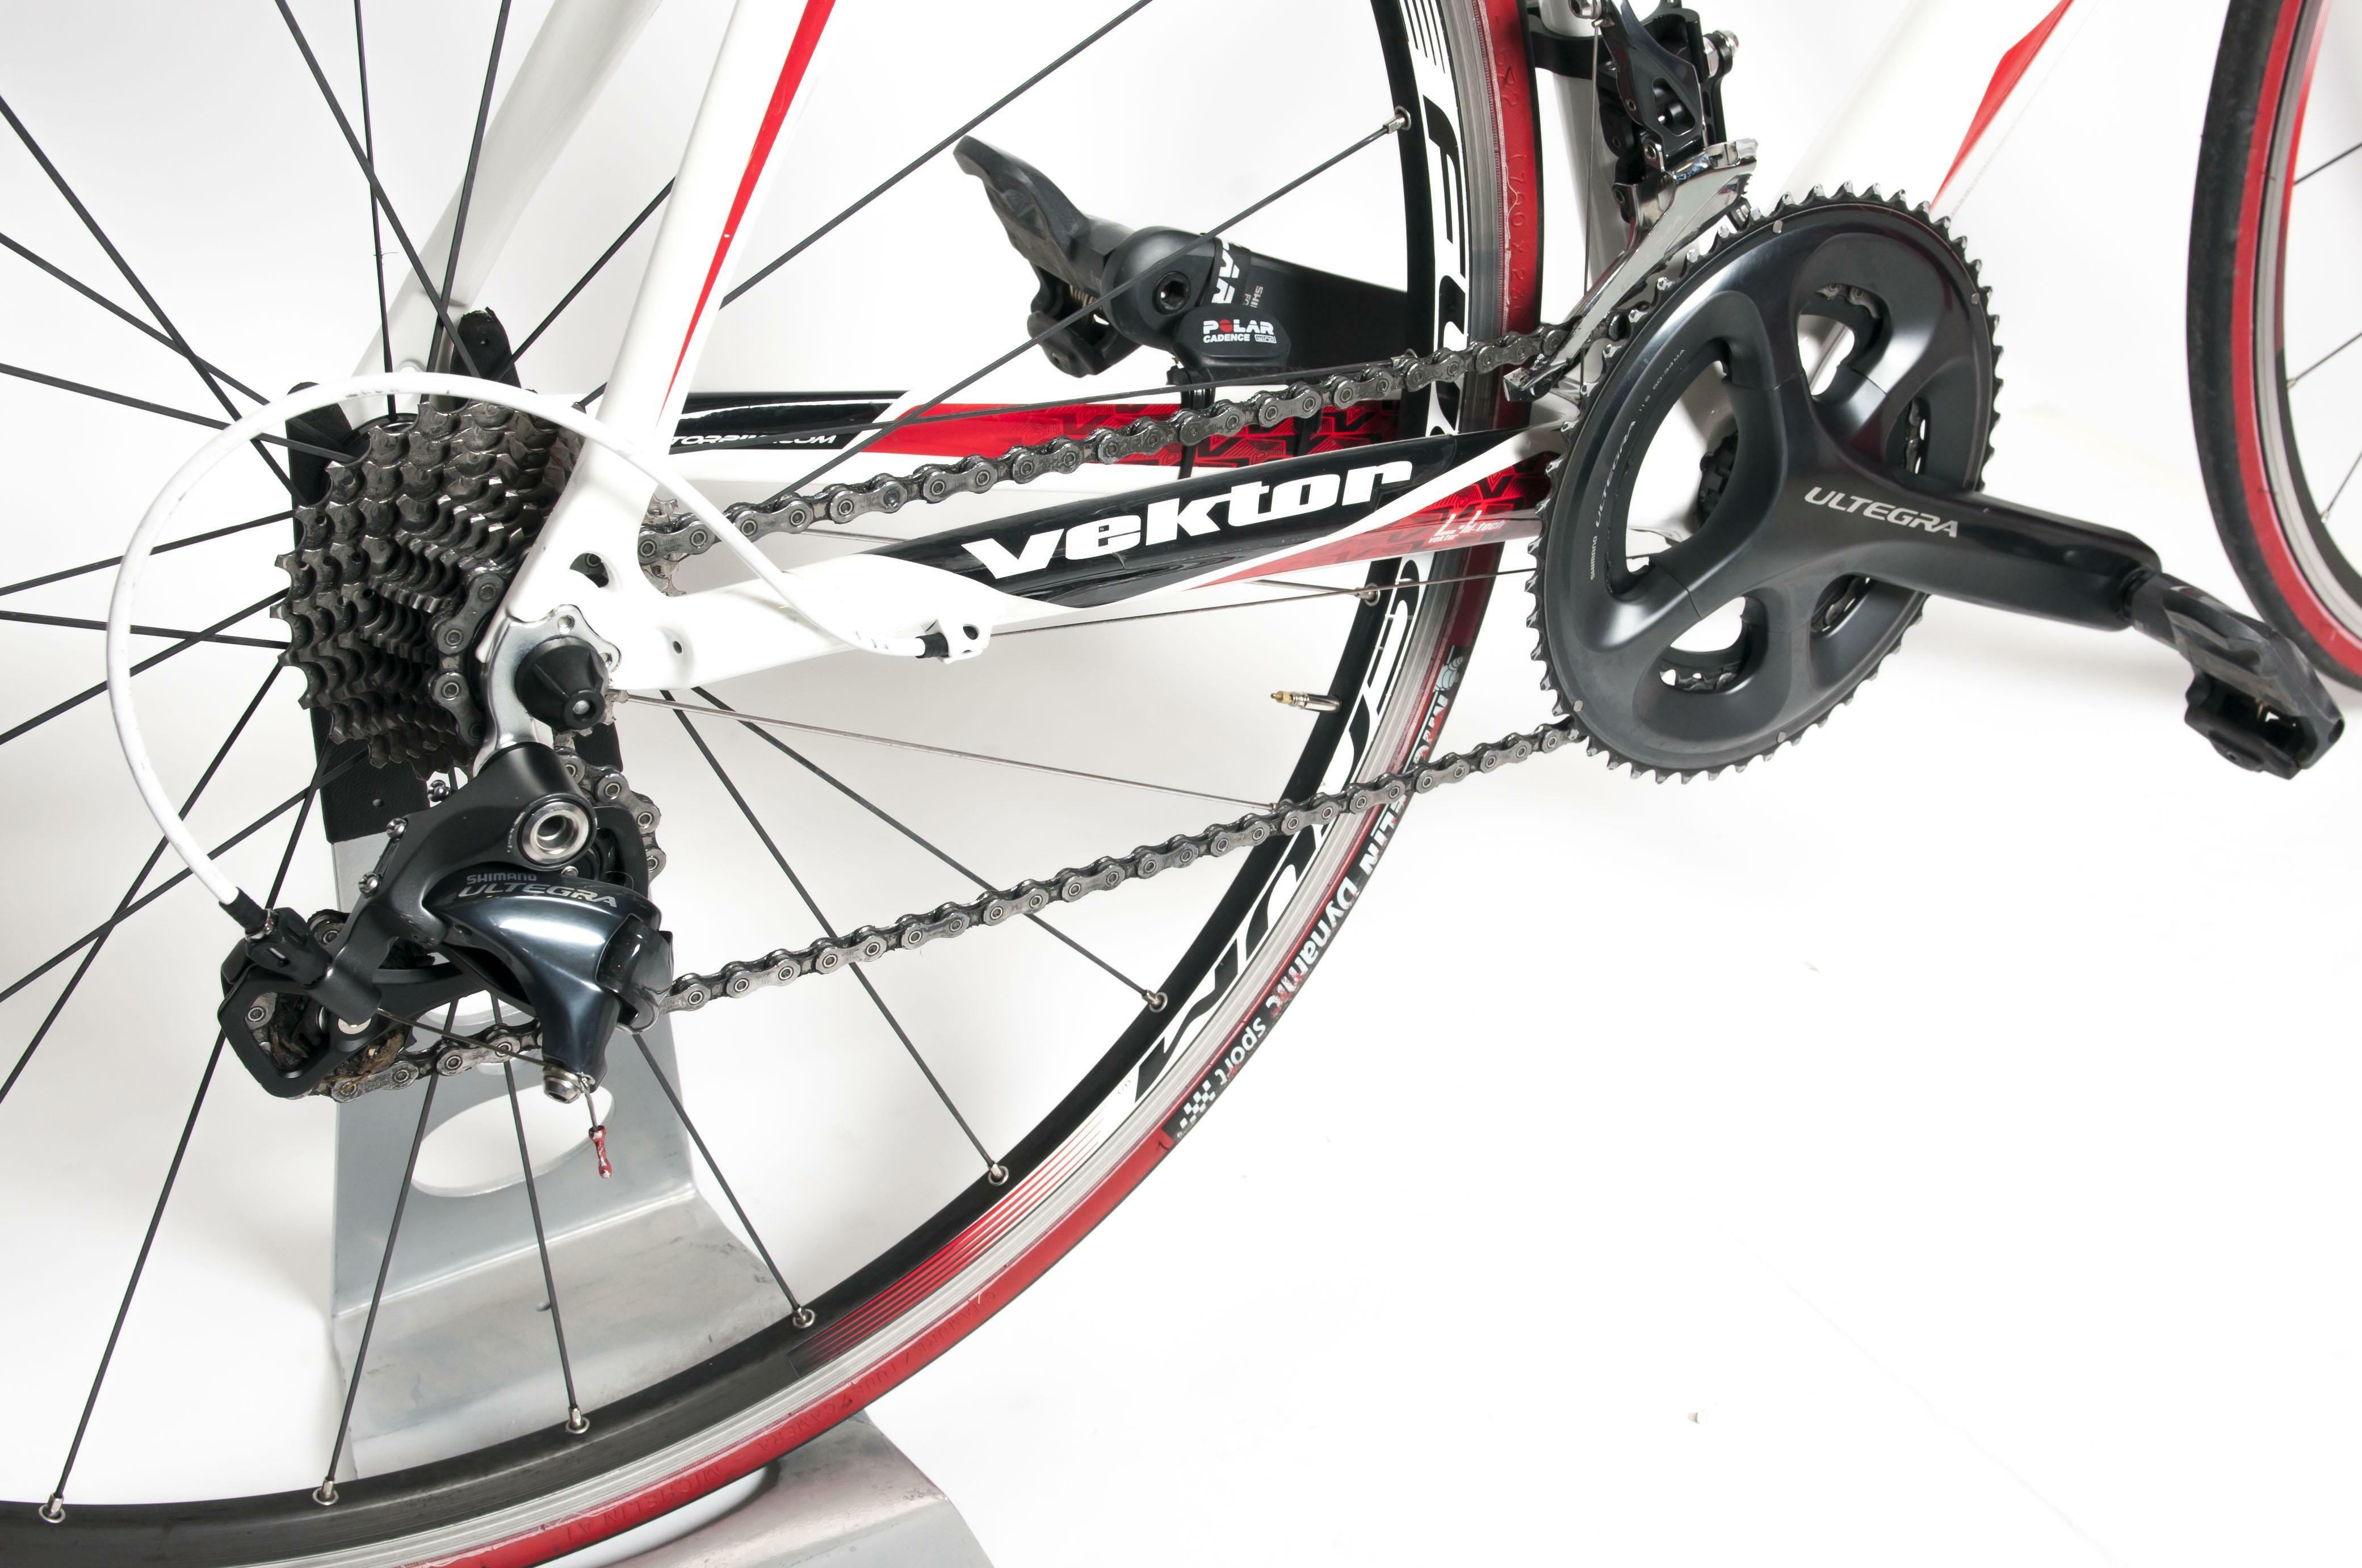 usato usato bici strada vektor seanence